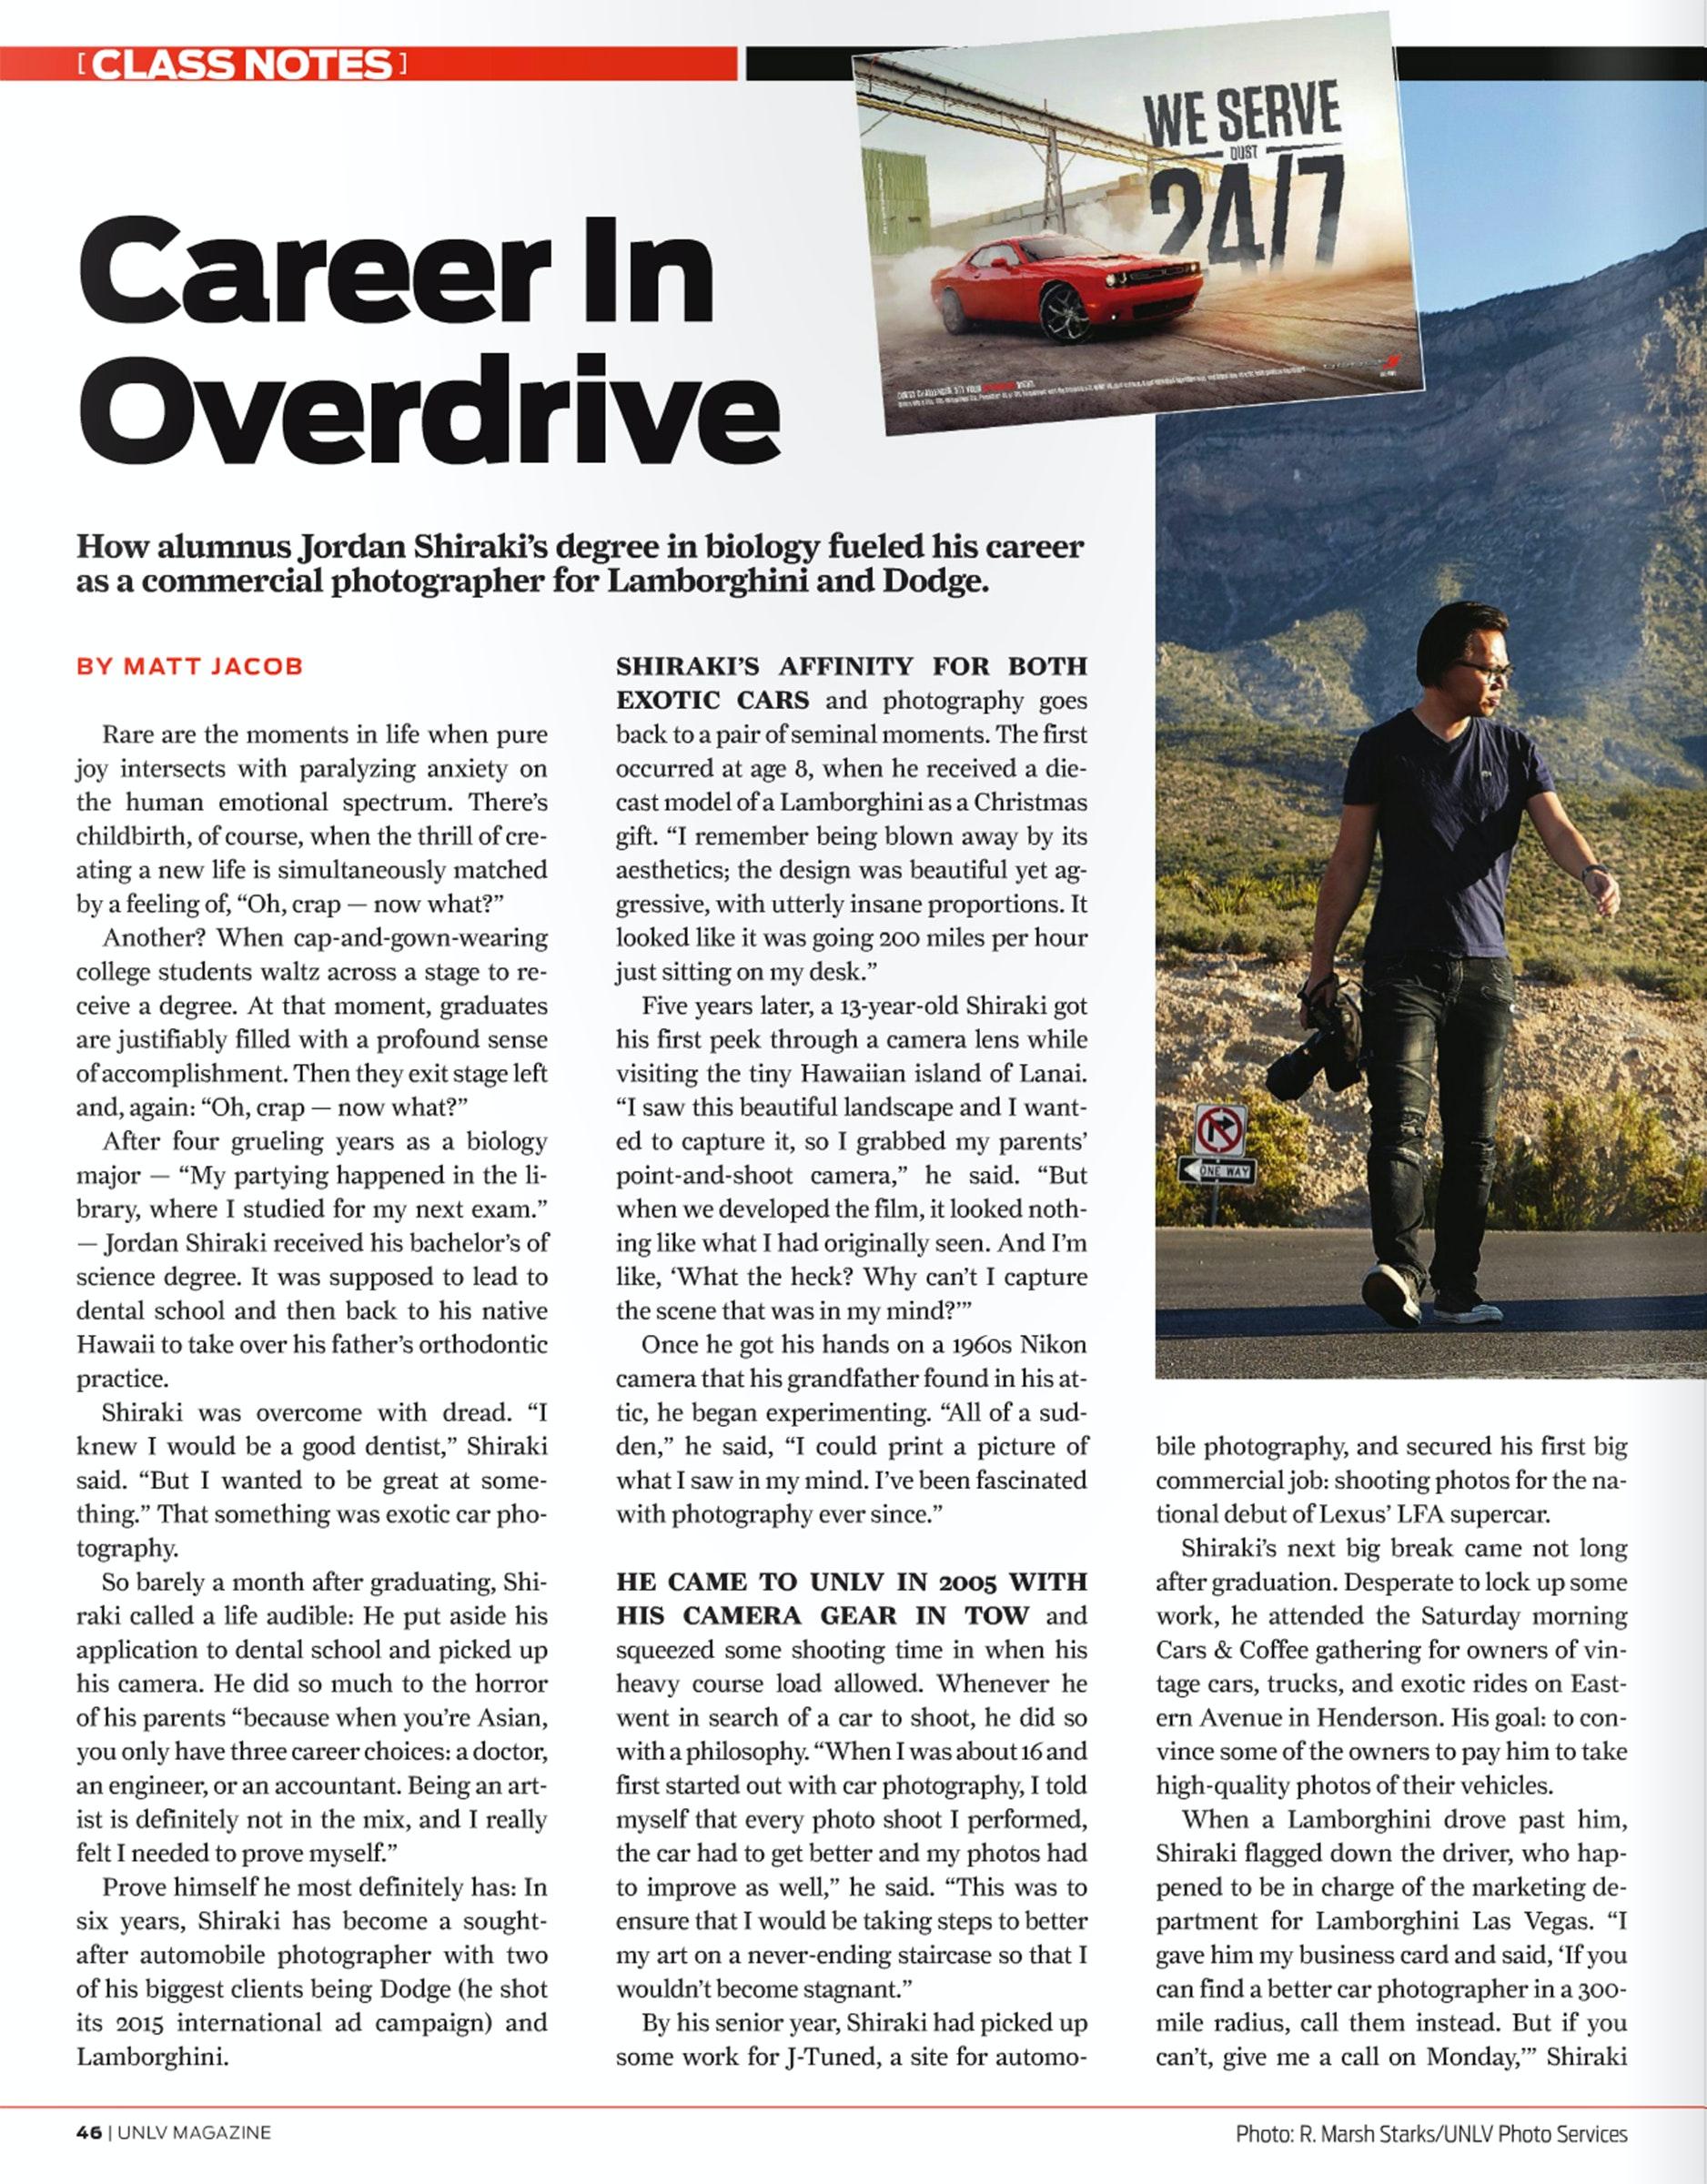 SHIRAKIPHOTO & DESIGN LLC - 0002_0071_unlv mag career in cover drive pg 1